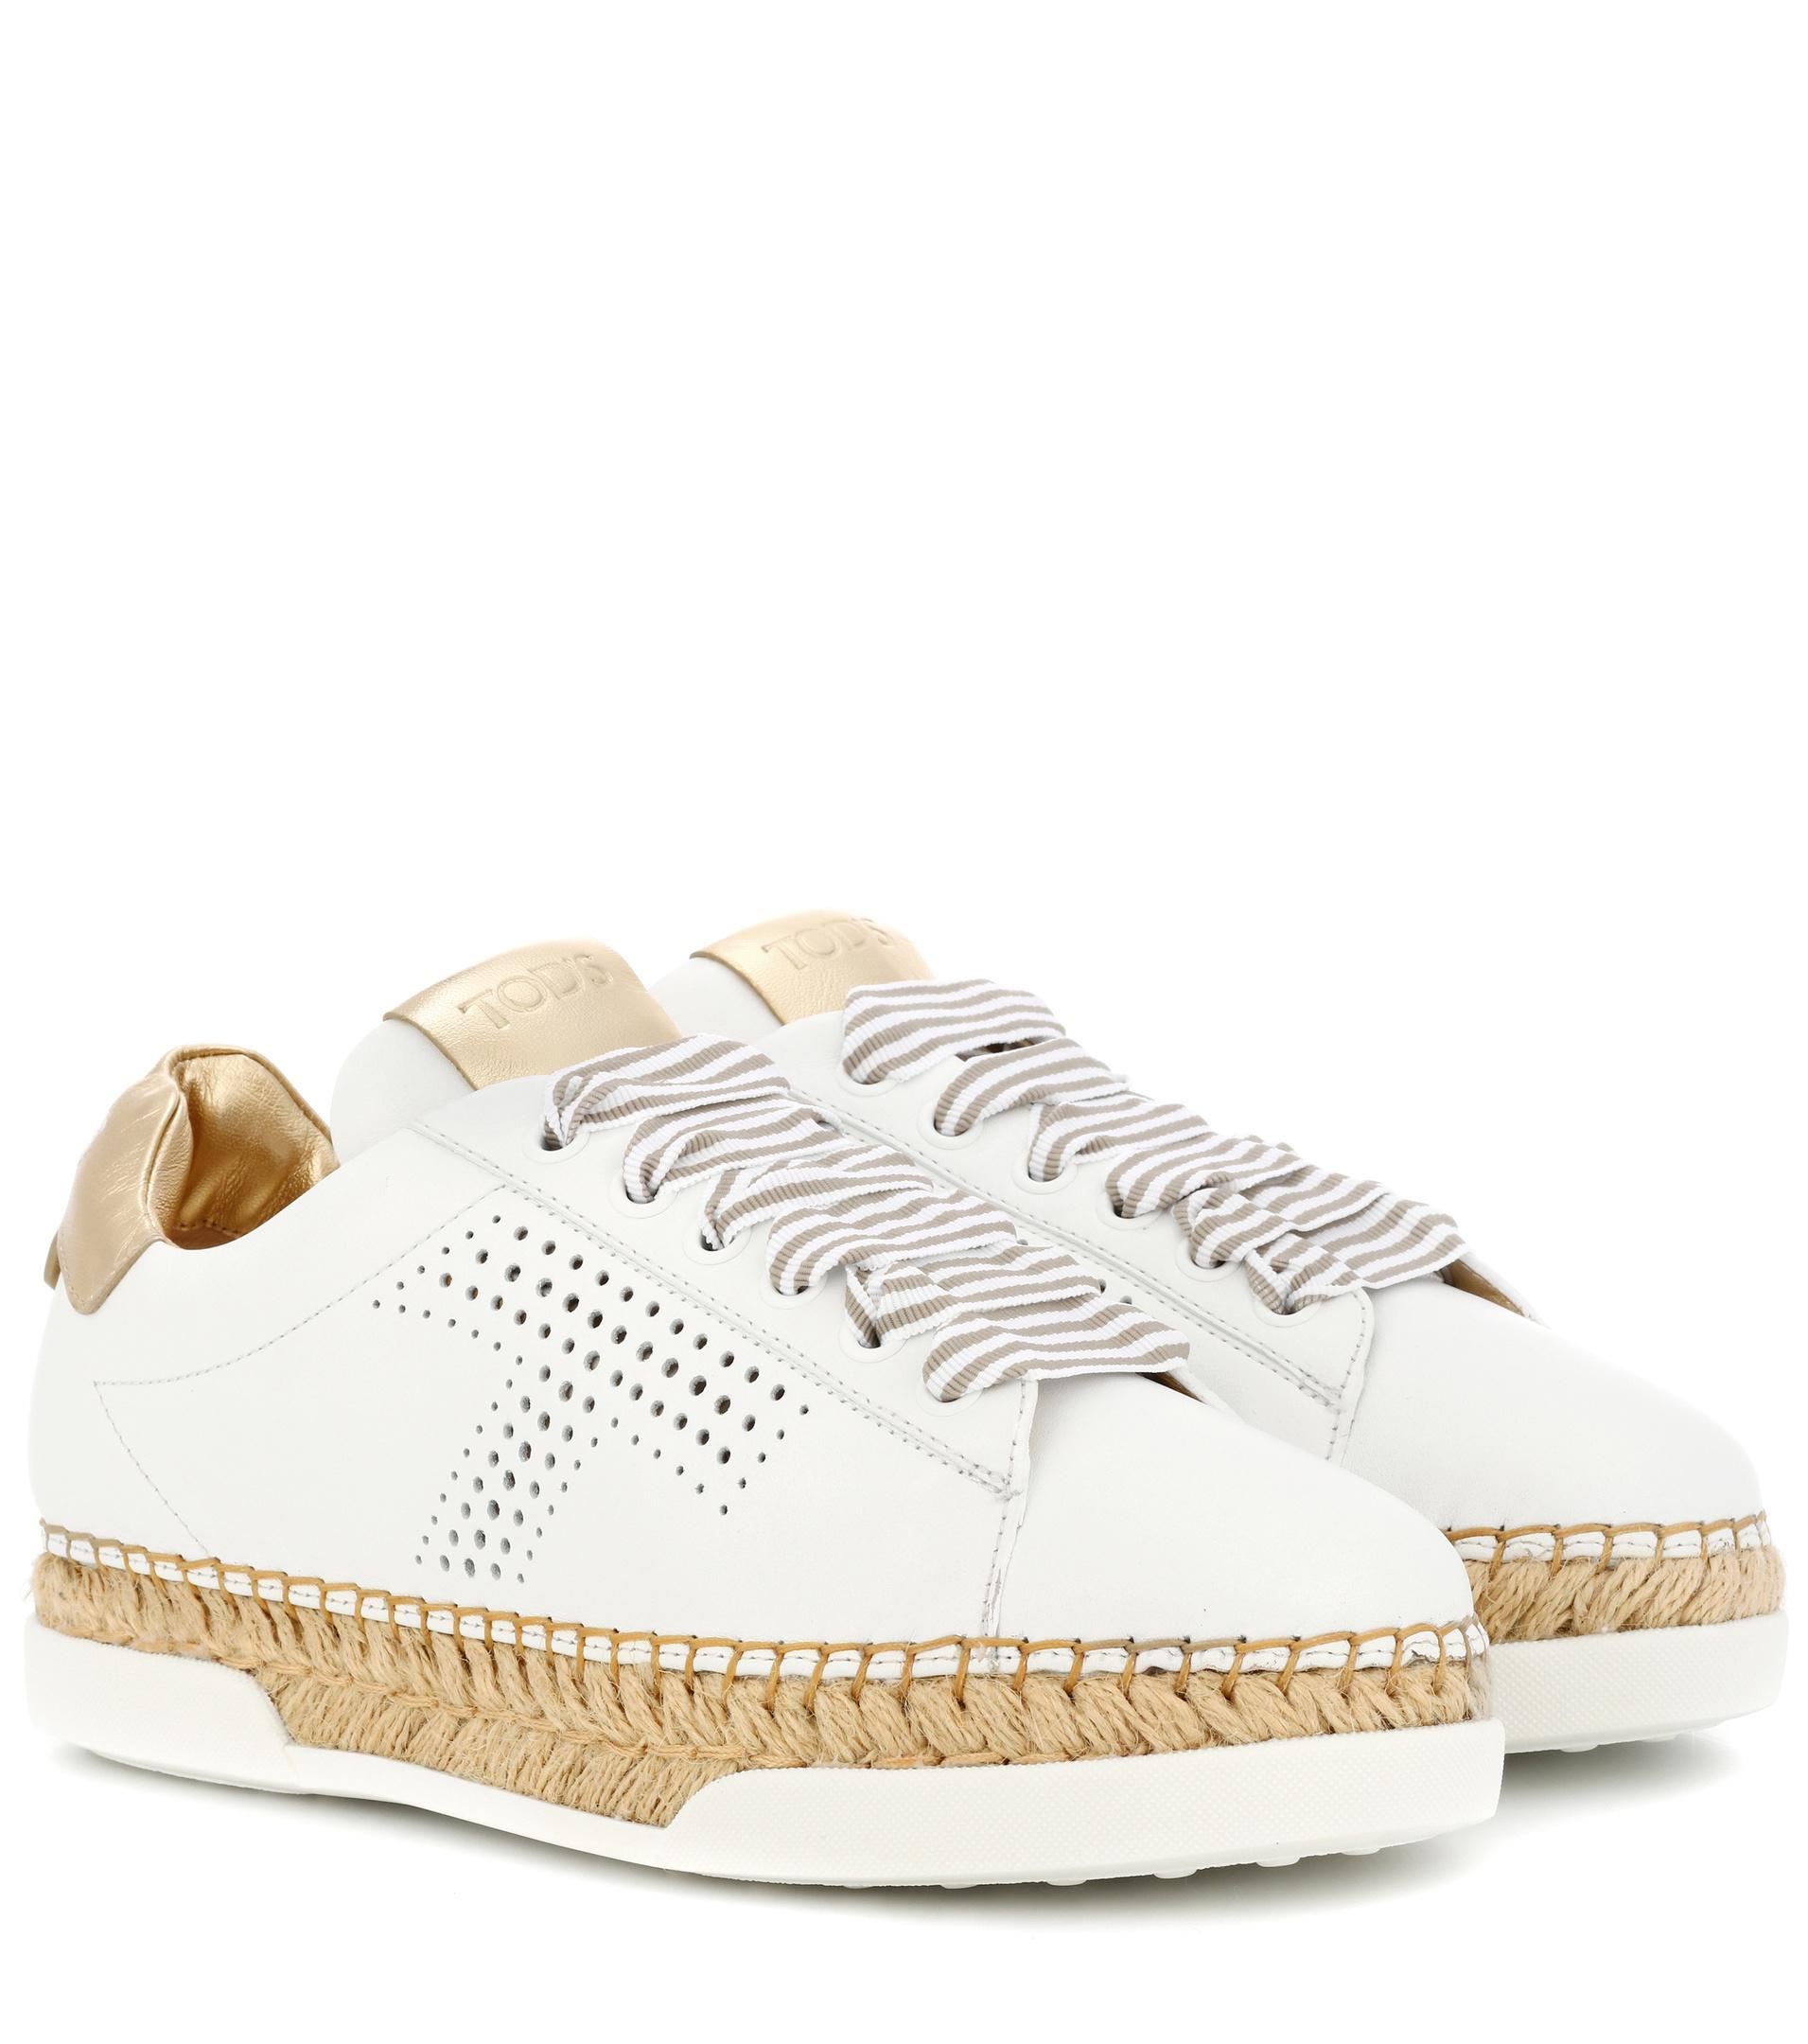 Gomma leather sneakers Tod's 8w8zRY3eIr